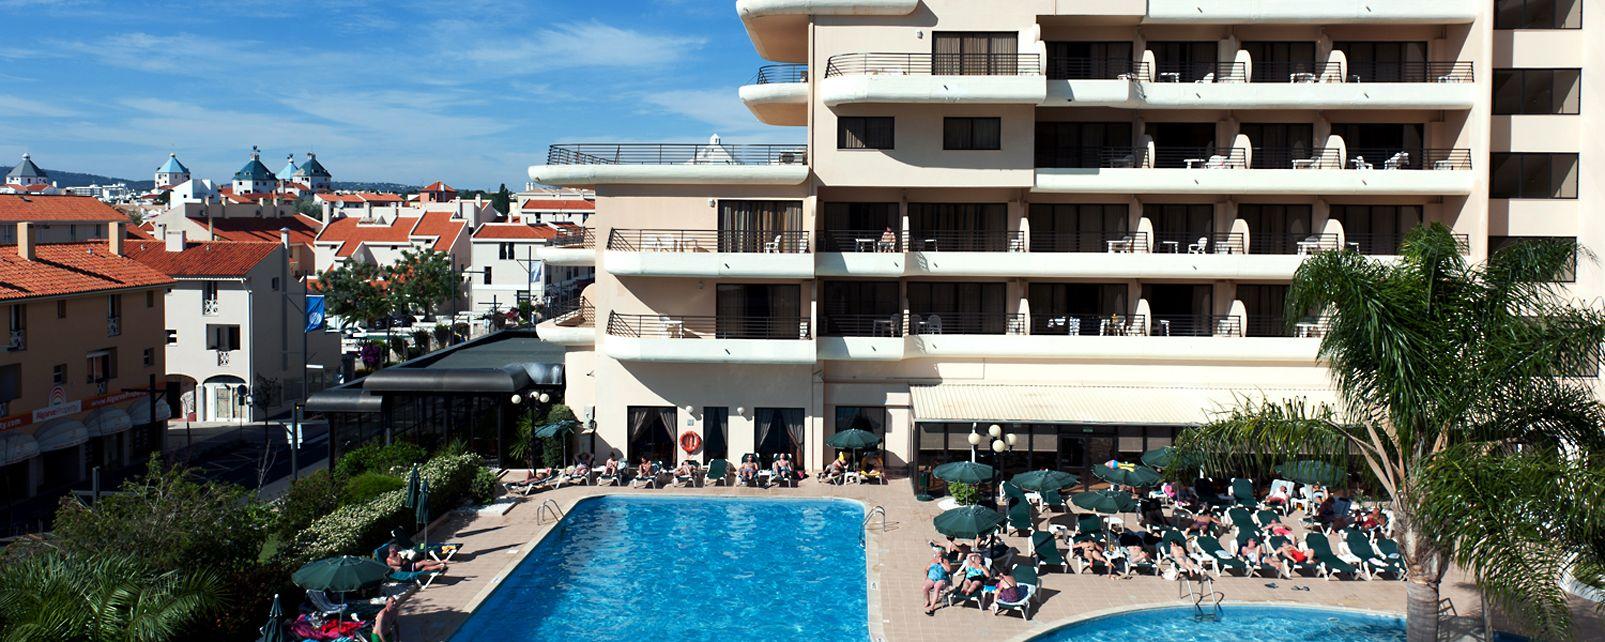 Hôtel Vila Galé Marina